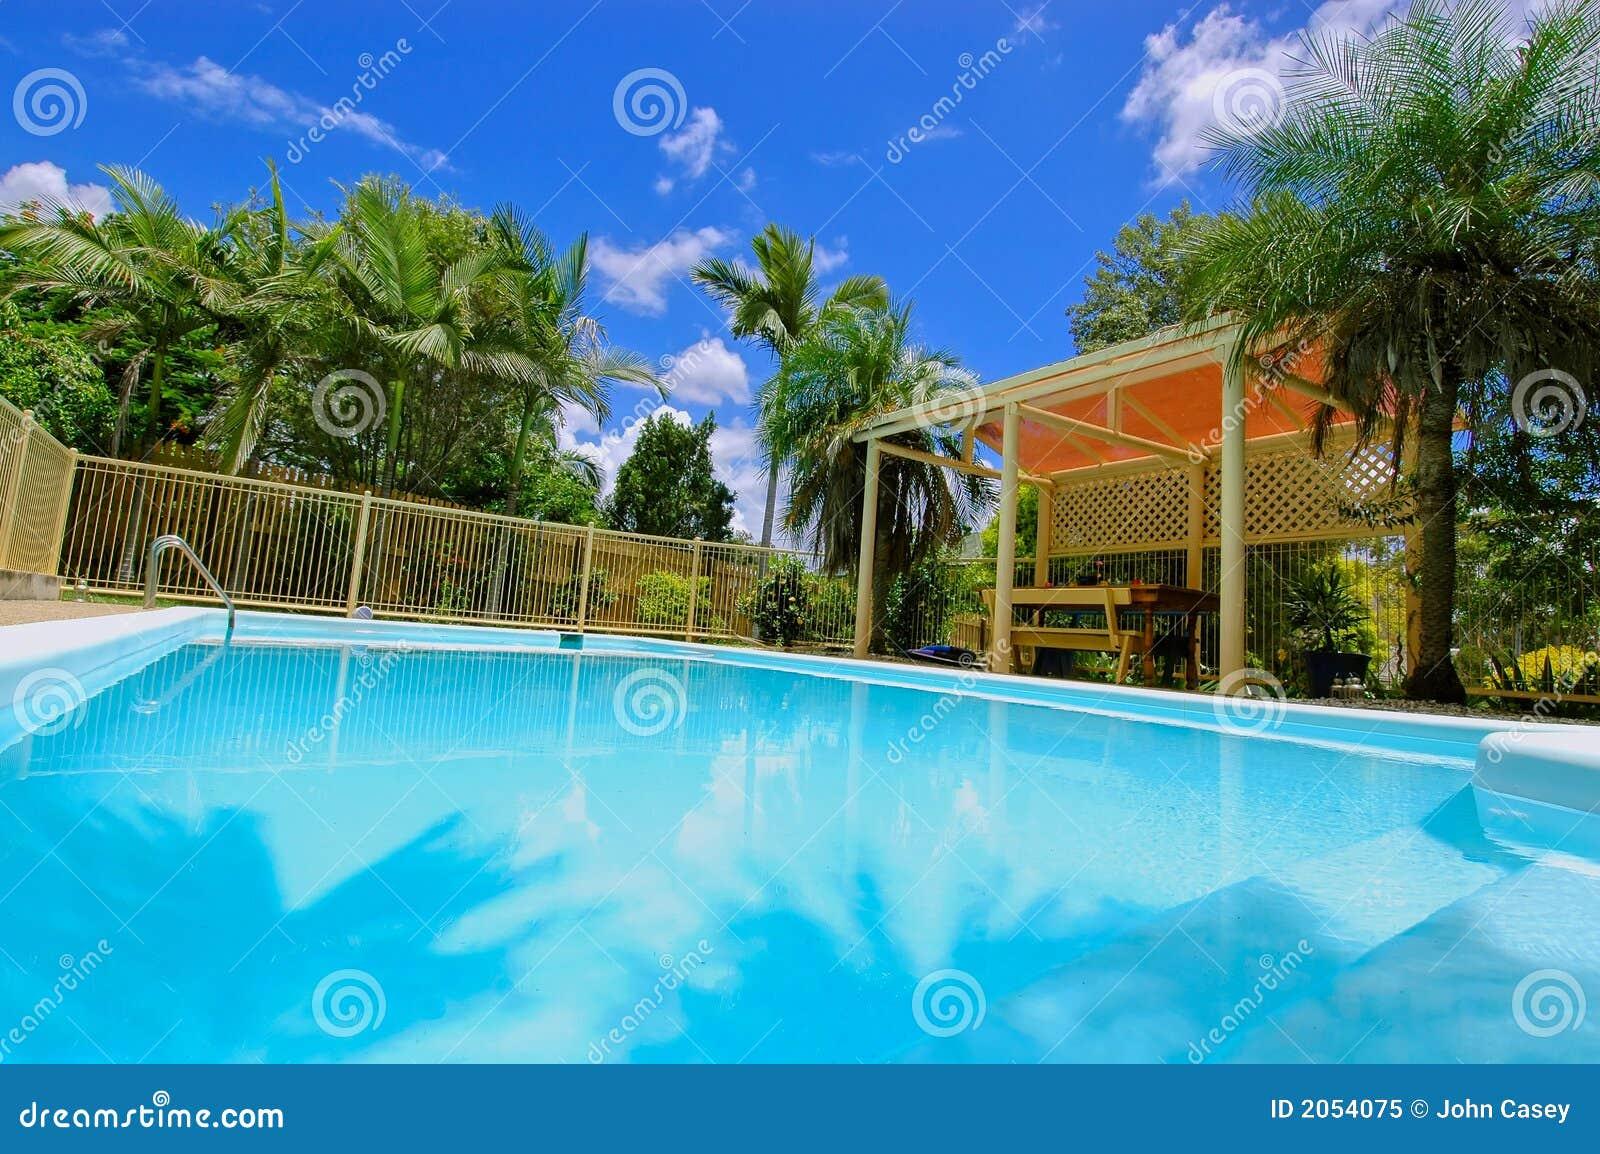 Luxury Backyard Swimming Pool Royalty Free Stock Photo Image